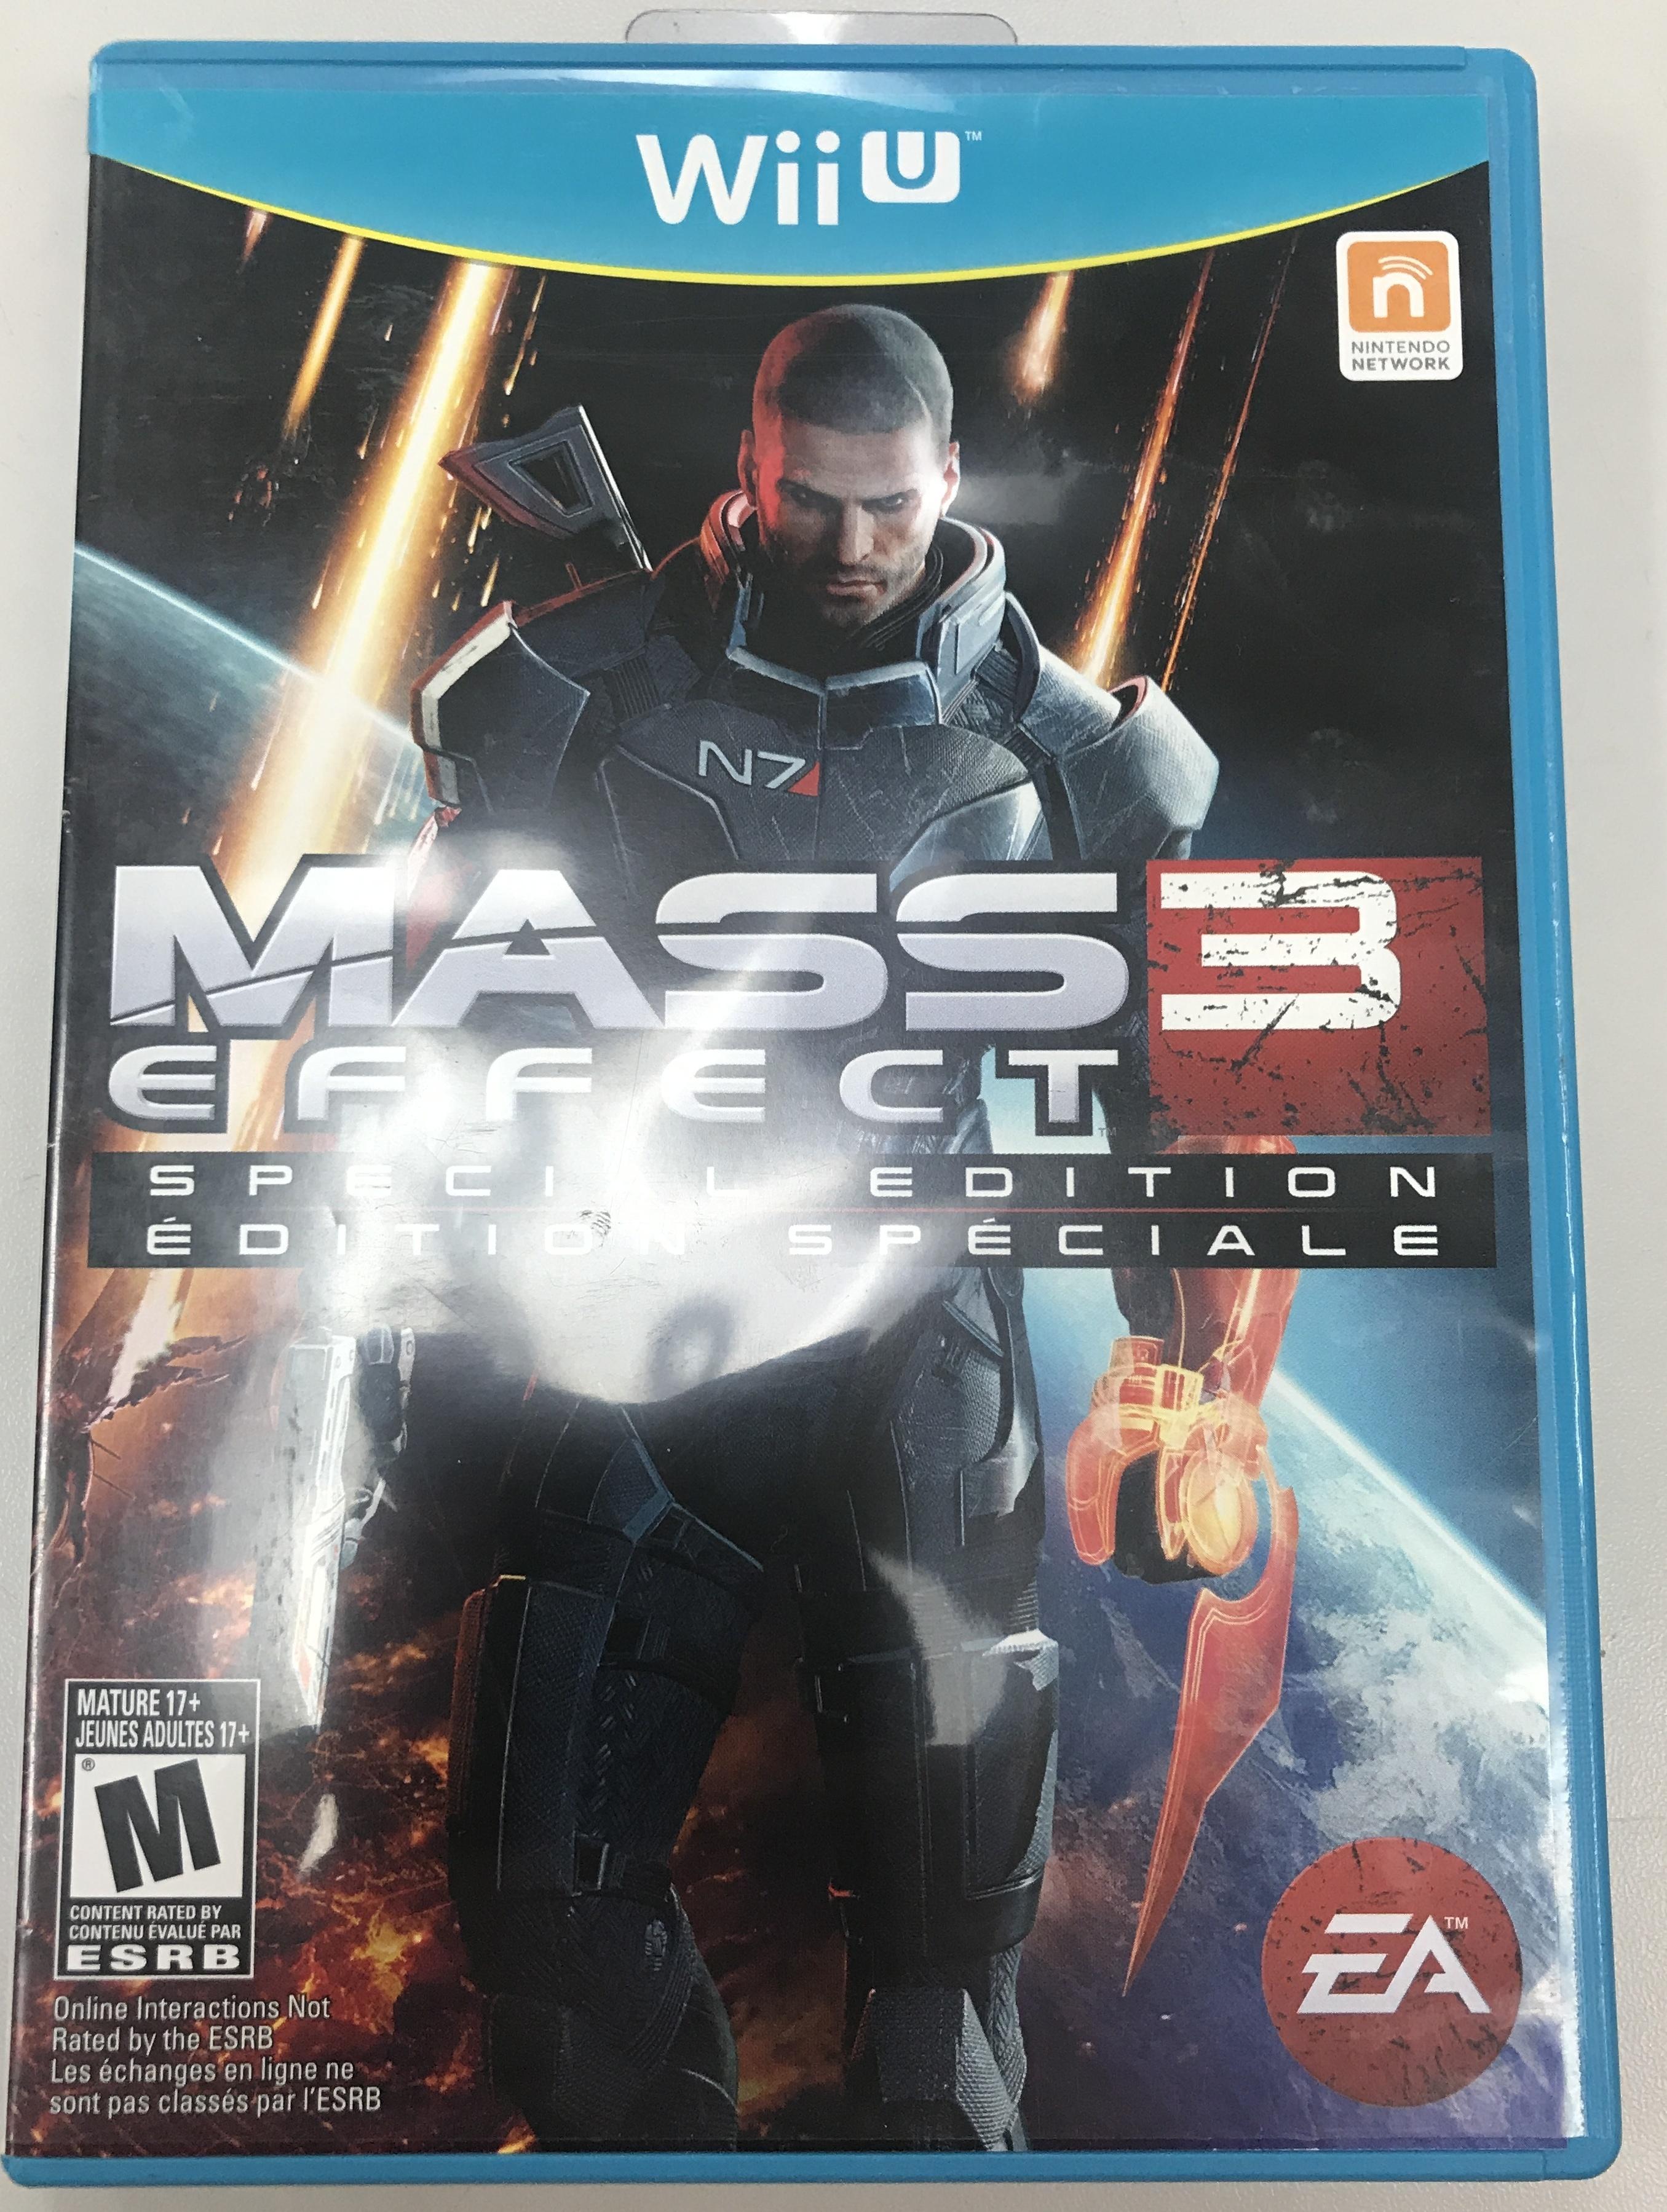 MASS EFFECT 3 SPECIAL EDITION -NINTENDO WII U GAME